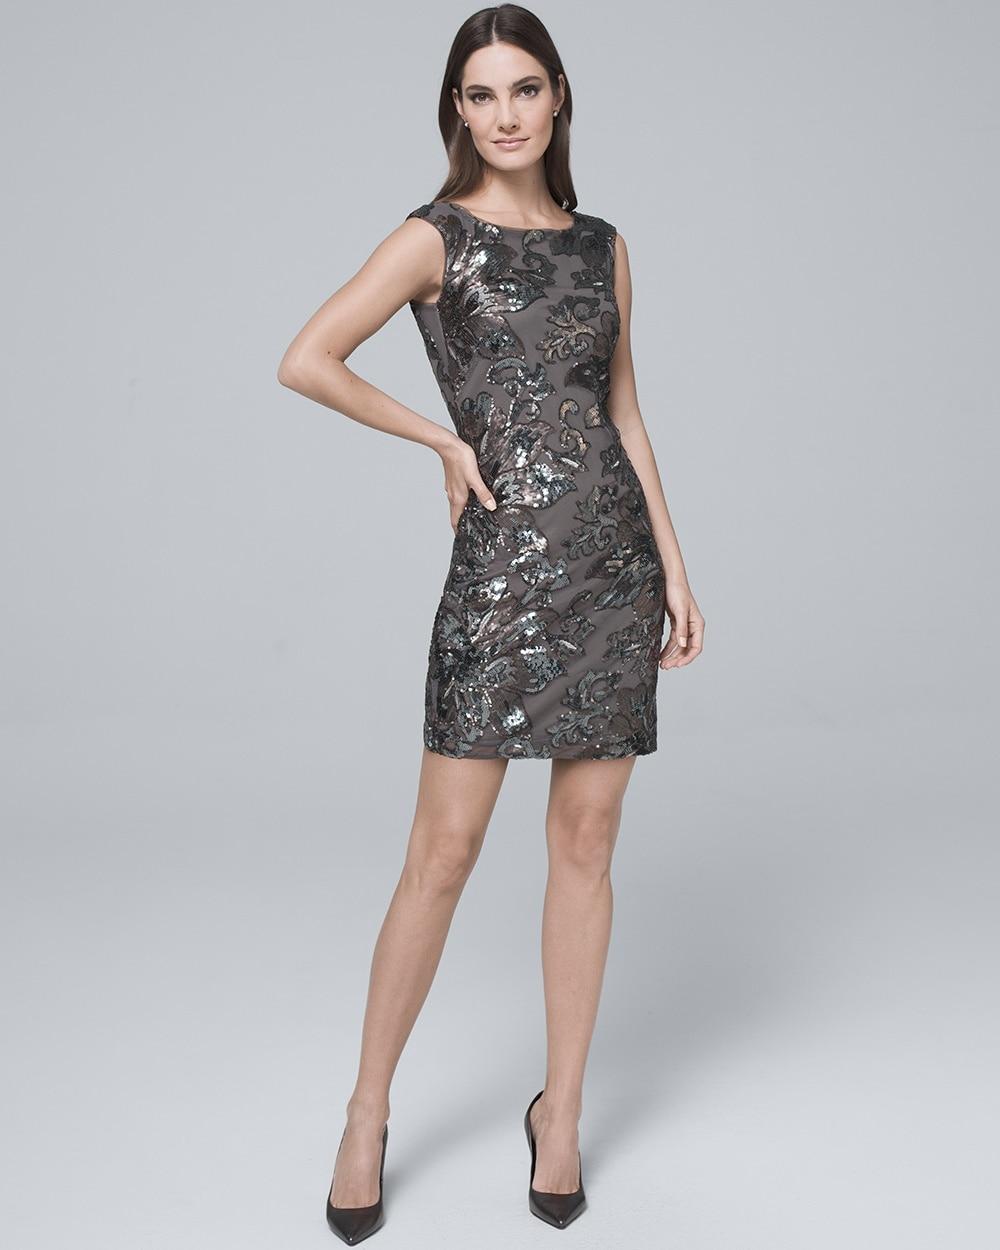 09ef48fa964 Black And White Sequin Dress - Photo Dress Wallpaper HD AOrg